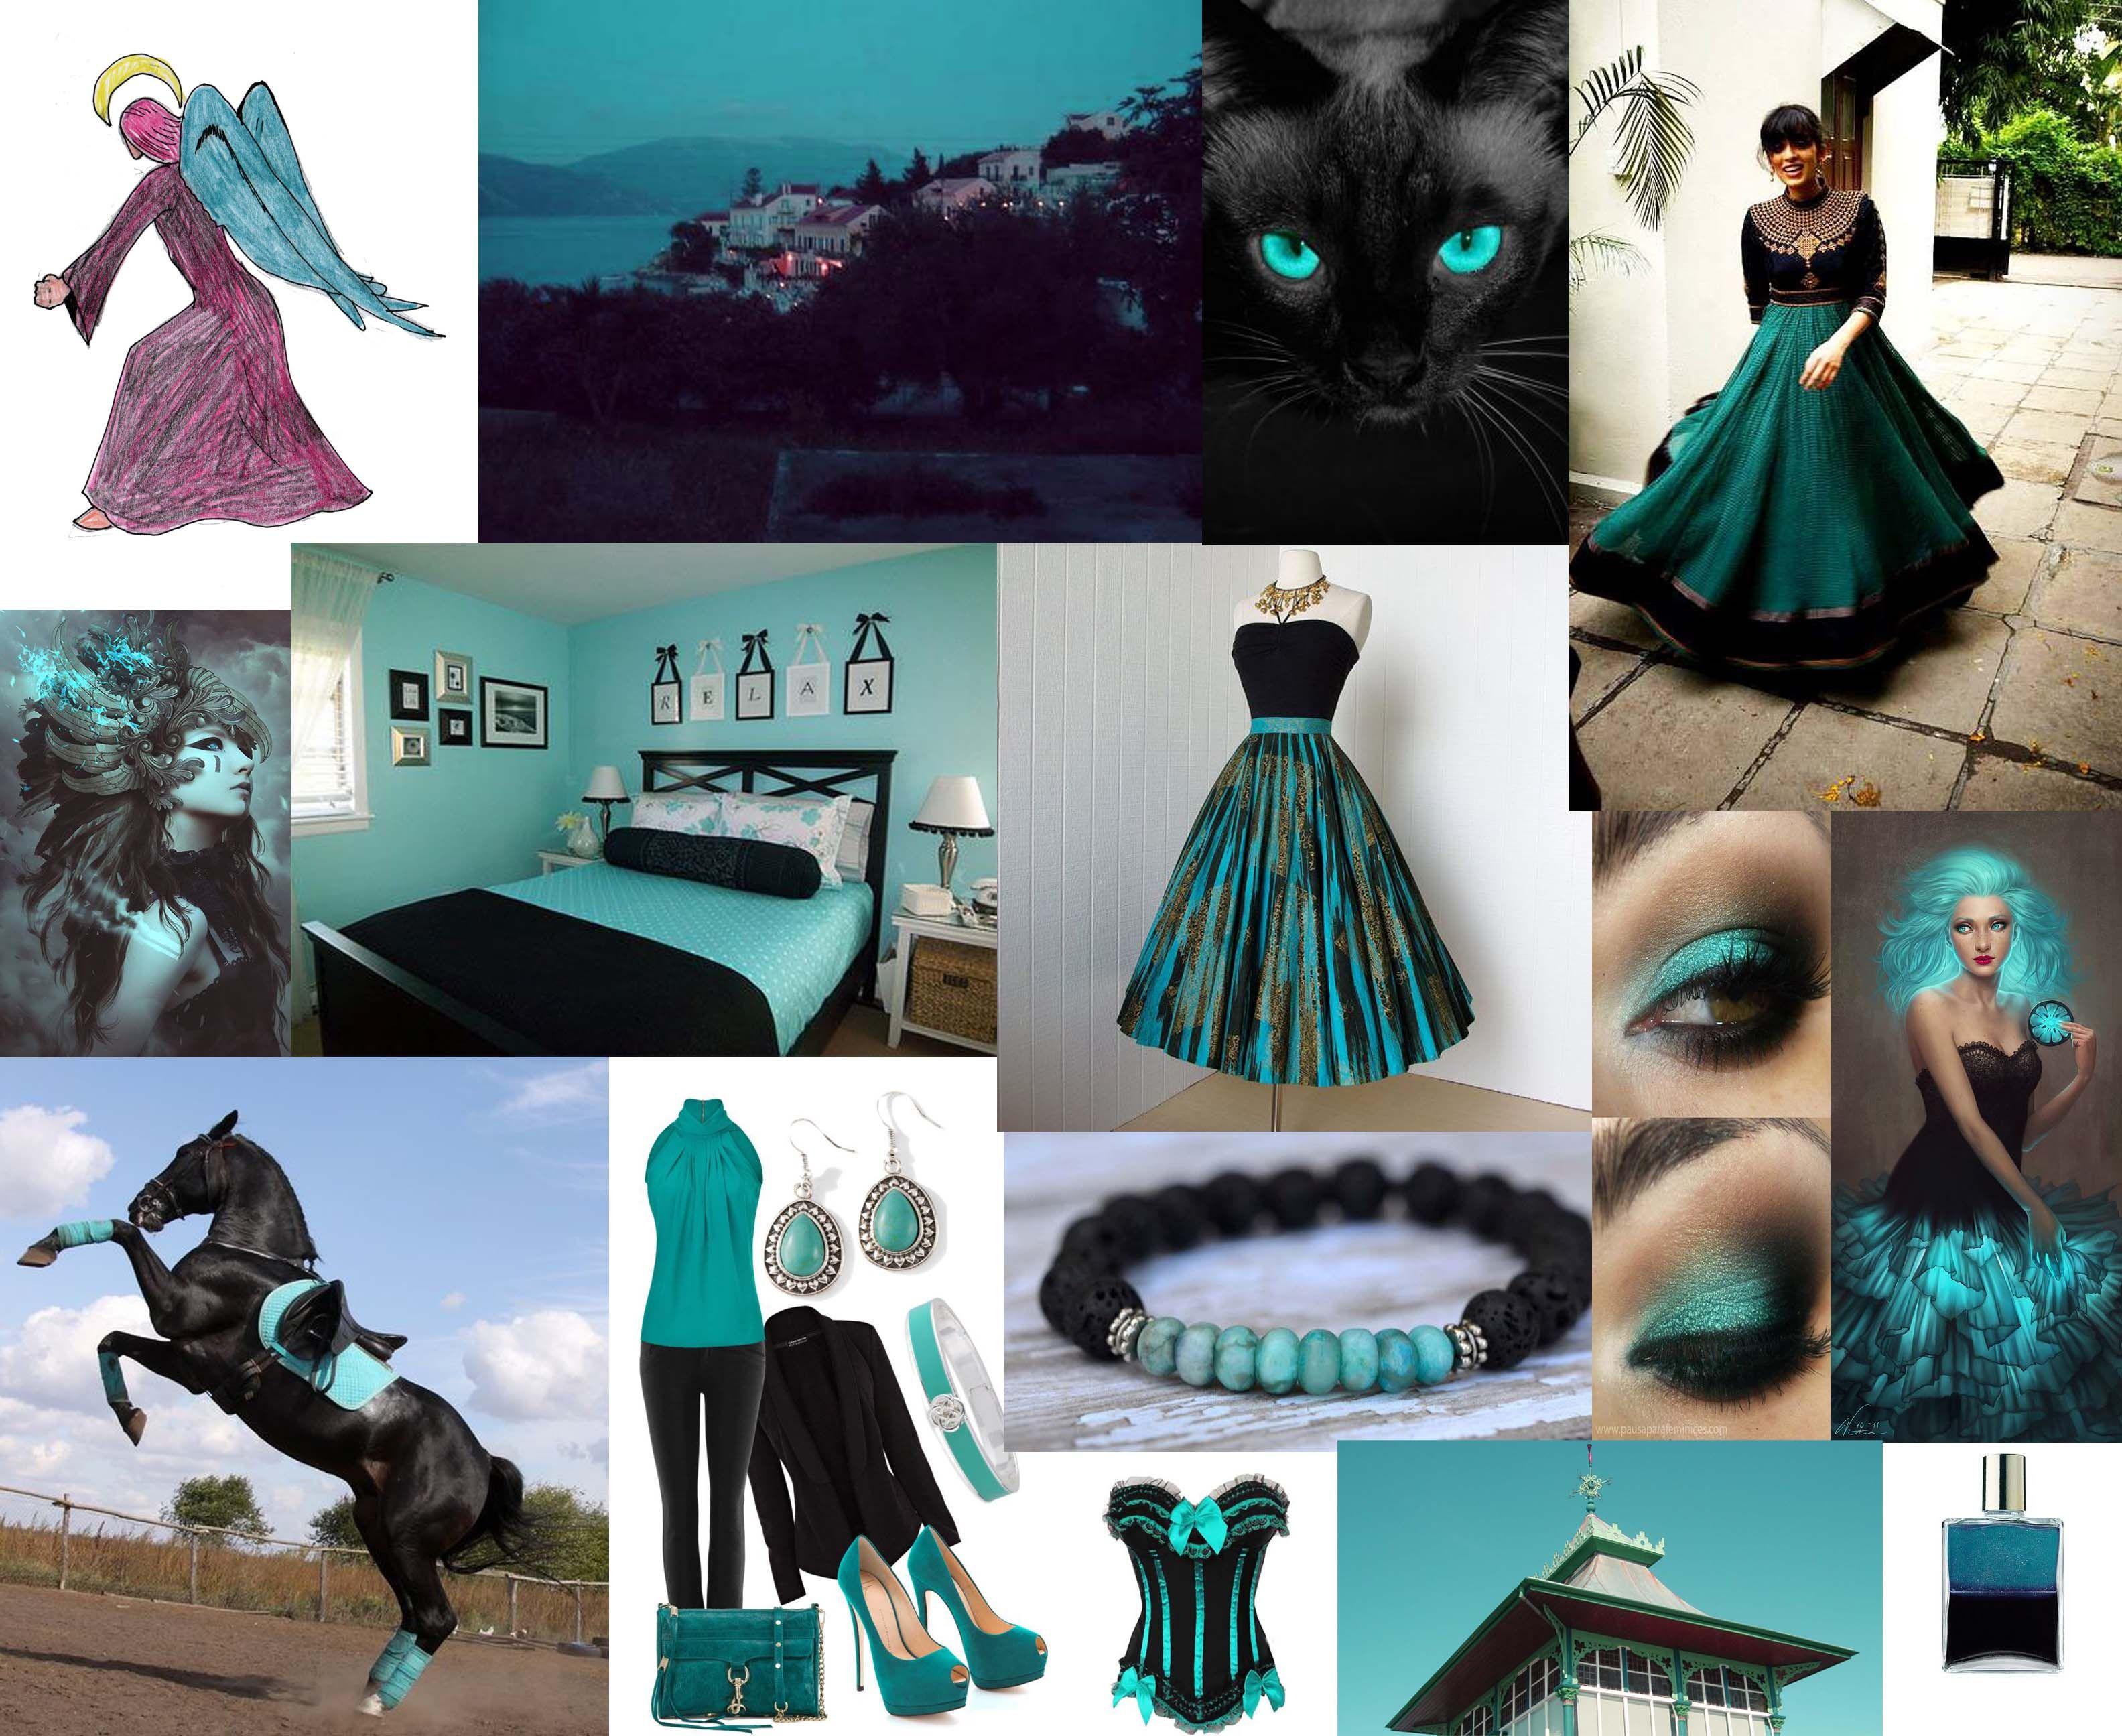 Julie Howlin Aura Soma Inspiration Equilibrium bottle #107 Archangel Tzaphkiel Turquoise/deep magenta